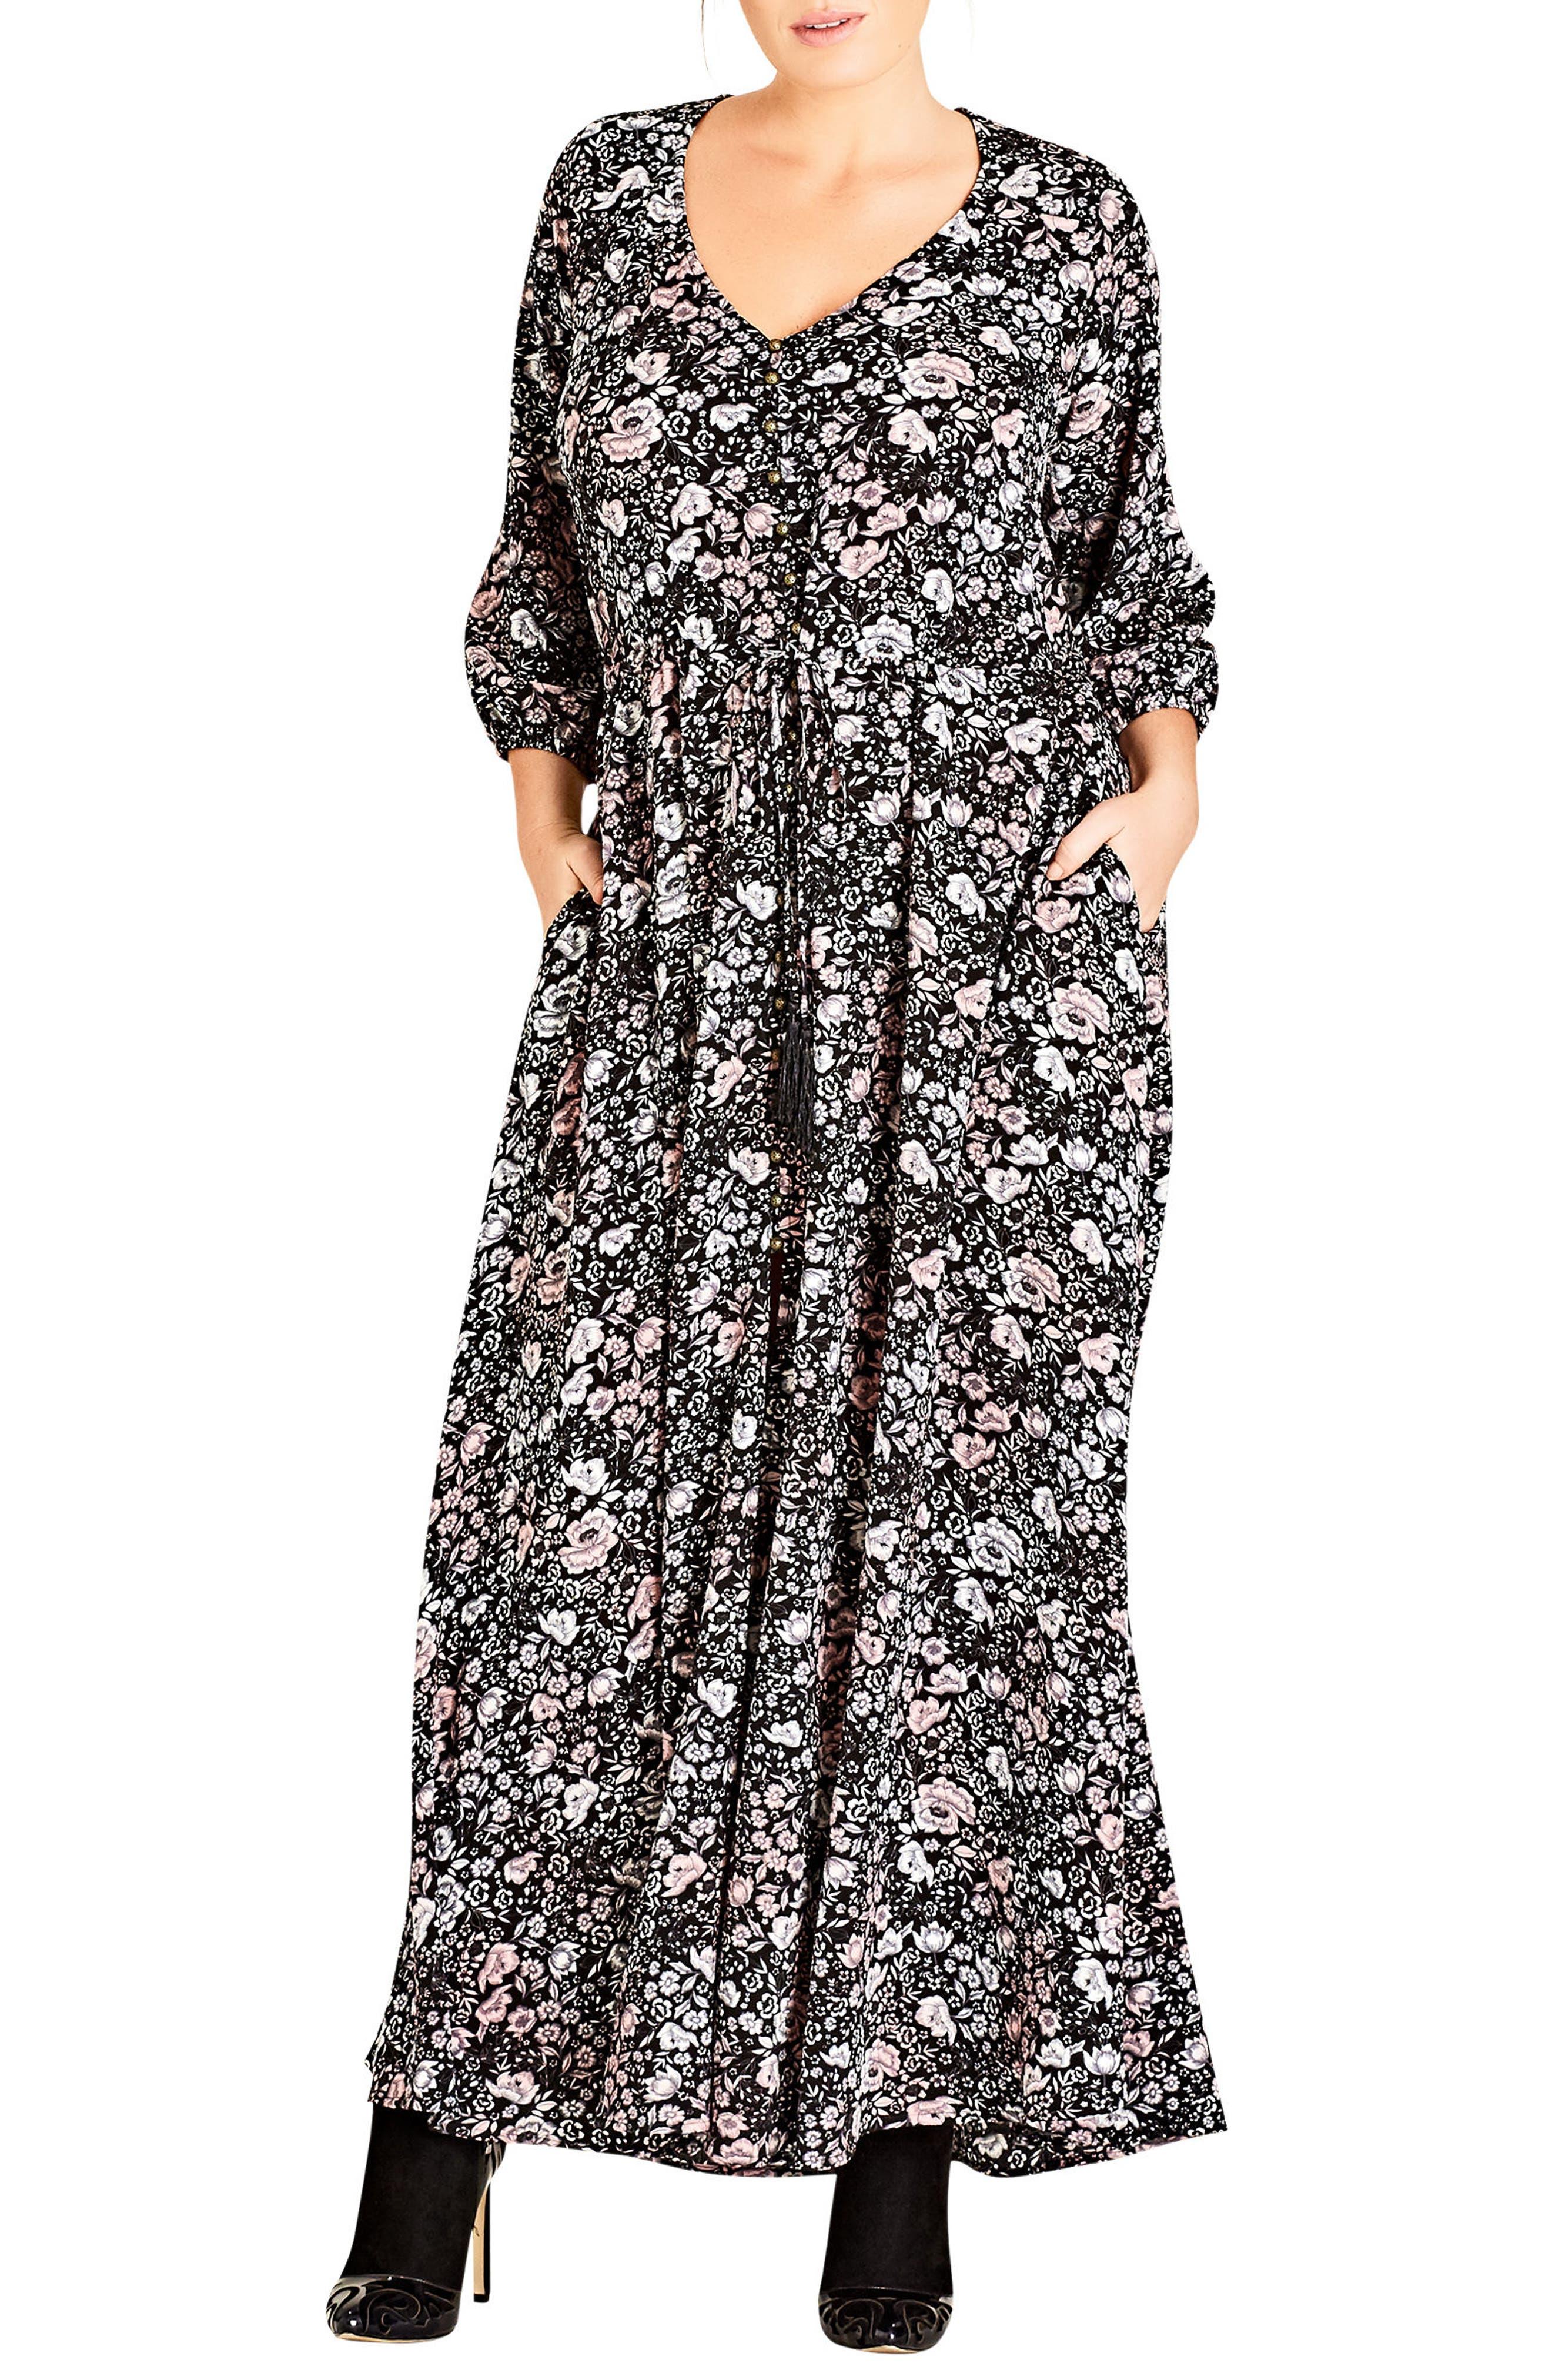 Etched Floral Maxi Dress,                         Main,                         color,